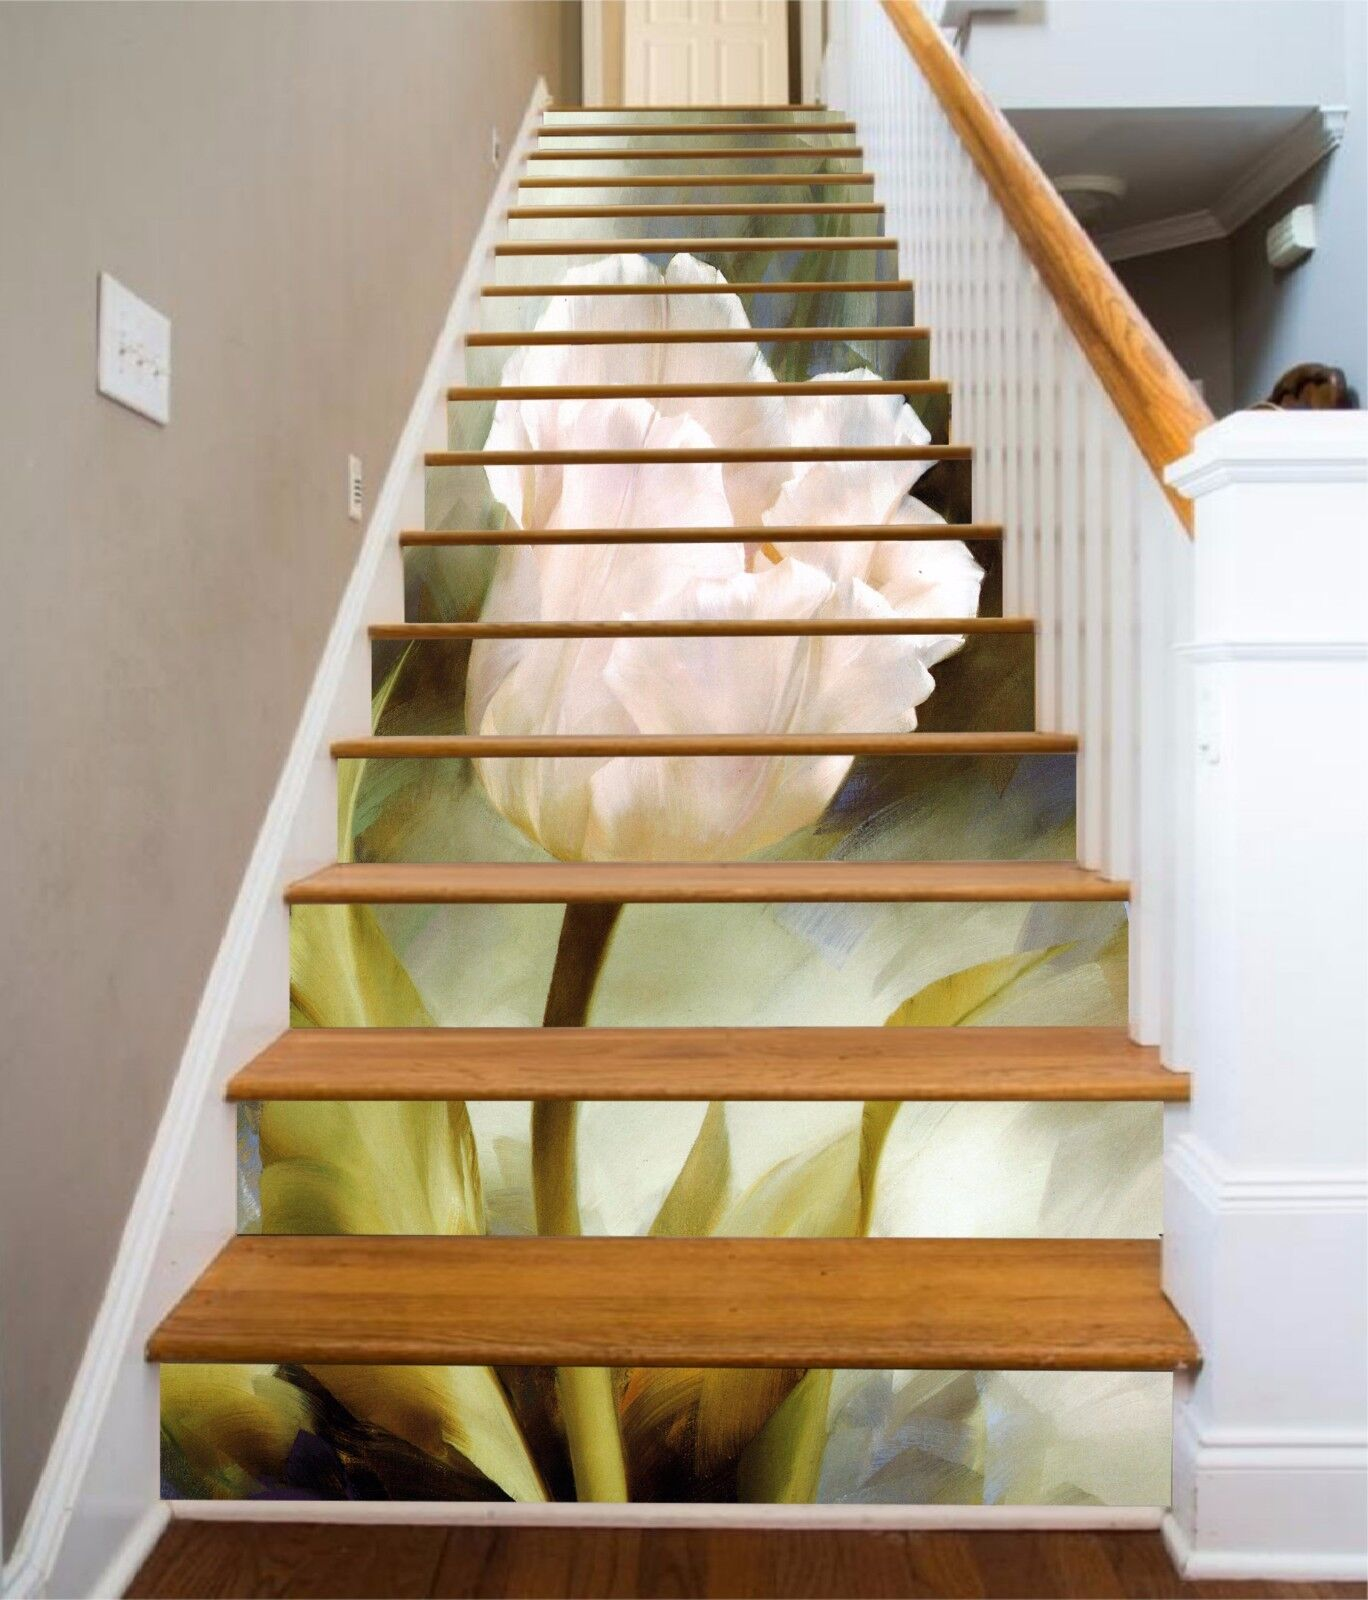 3D Elegant Flower 1 Stair Risers Decoration Photo Mural Vinyl Decal Wallpaper UK